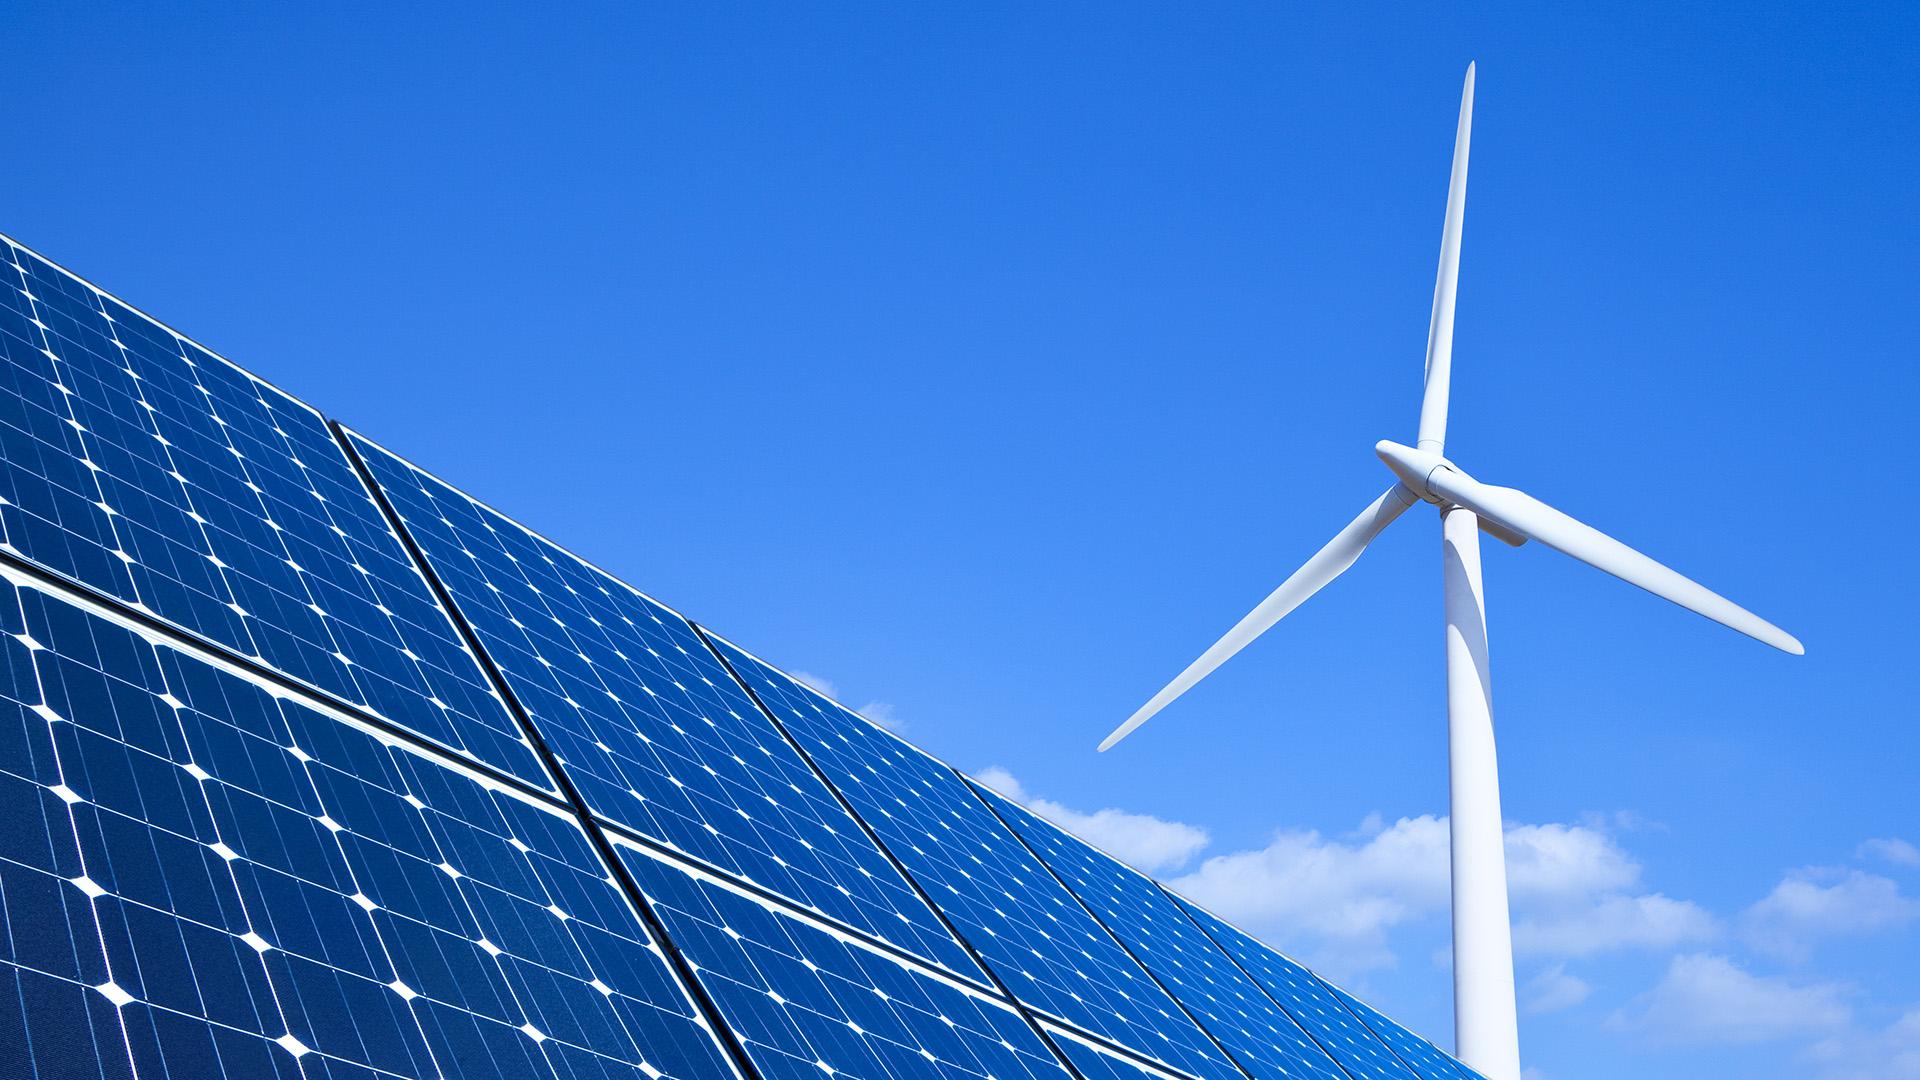 Solar panel and turbine under blue sky